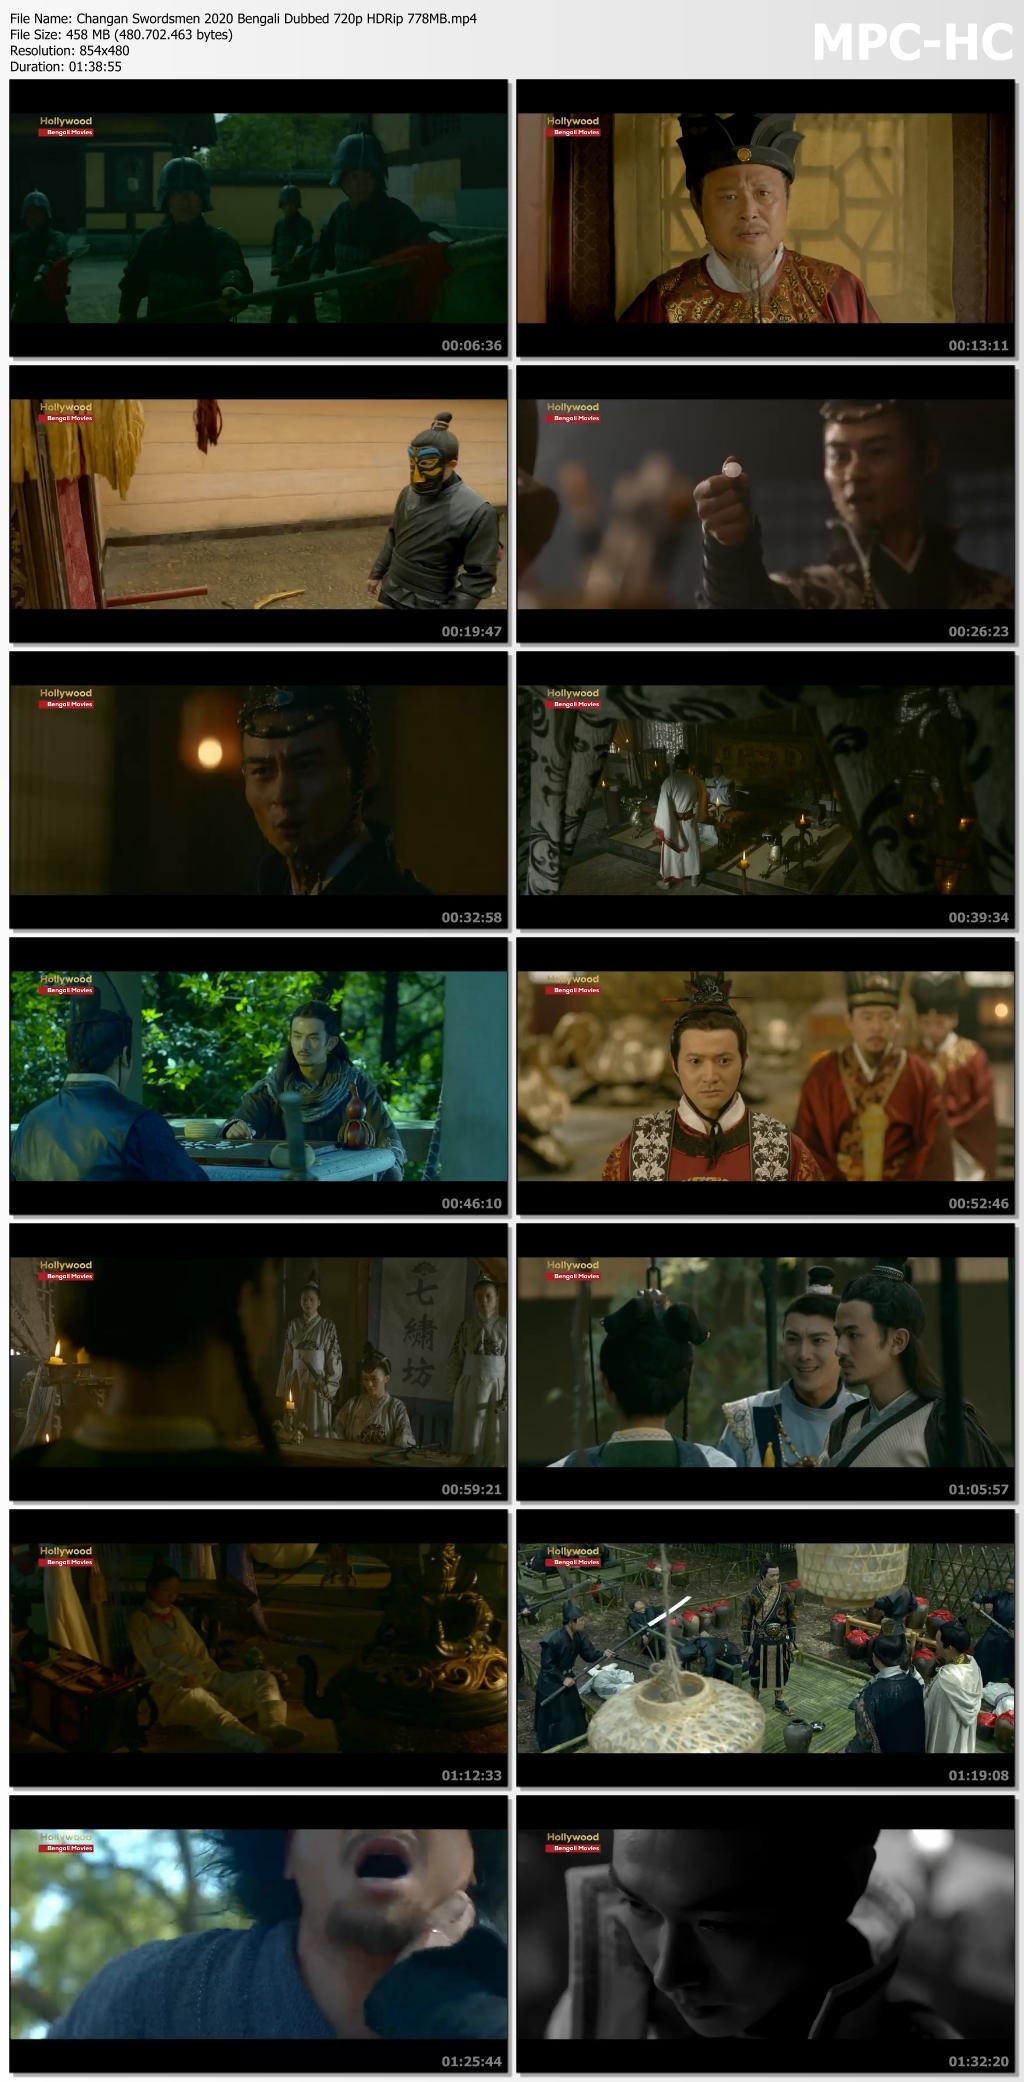 Changan-Swordsmen-2020-Bengali-Dubbed-720p-HDRip-778-MB-mp4-thumbs